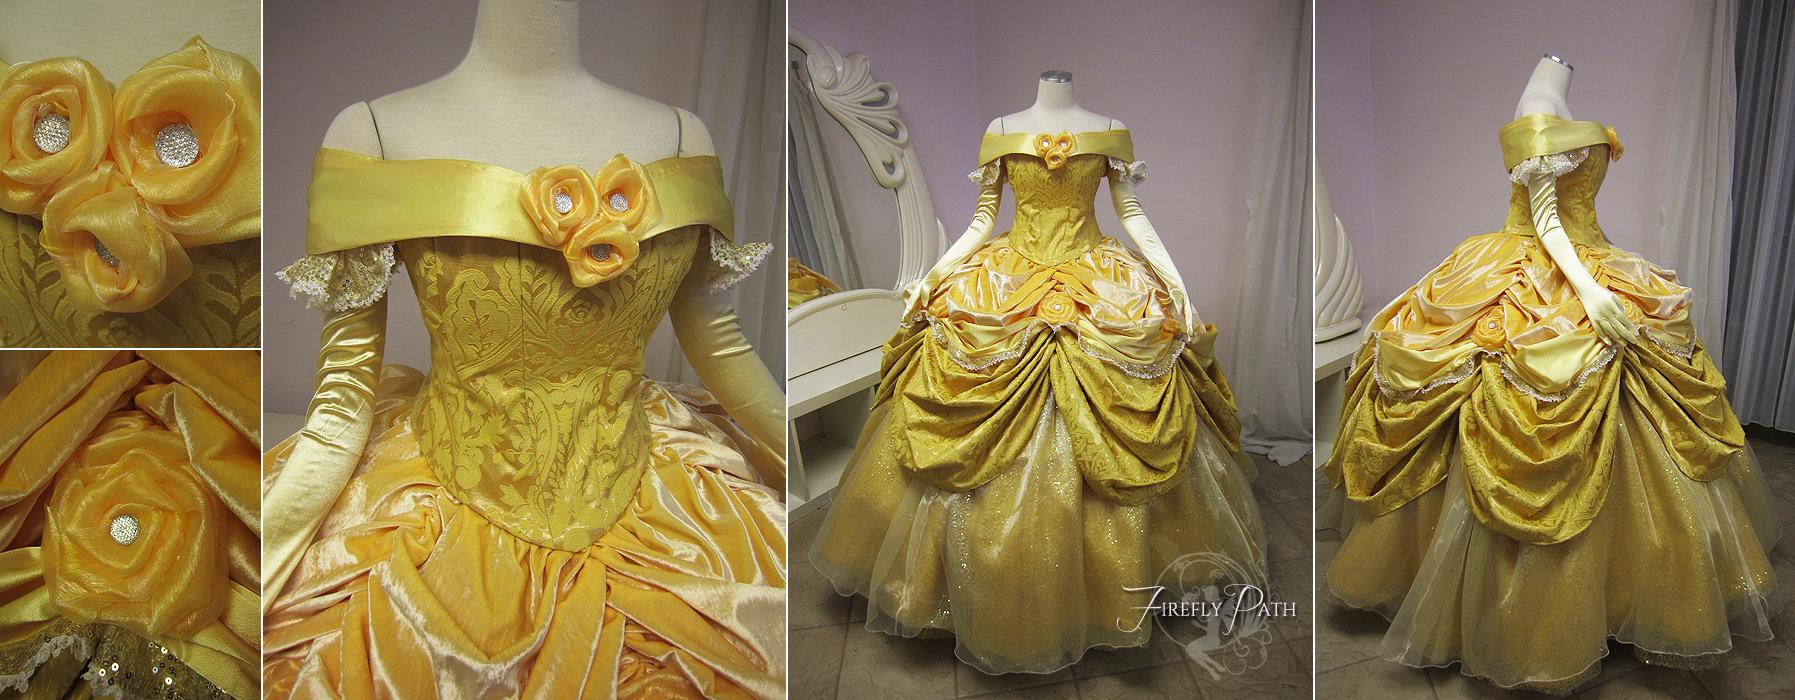 Belle Dress Disney Park Version by Lillyxandra on DeviantArt